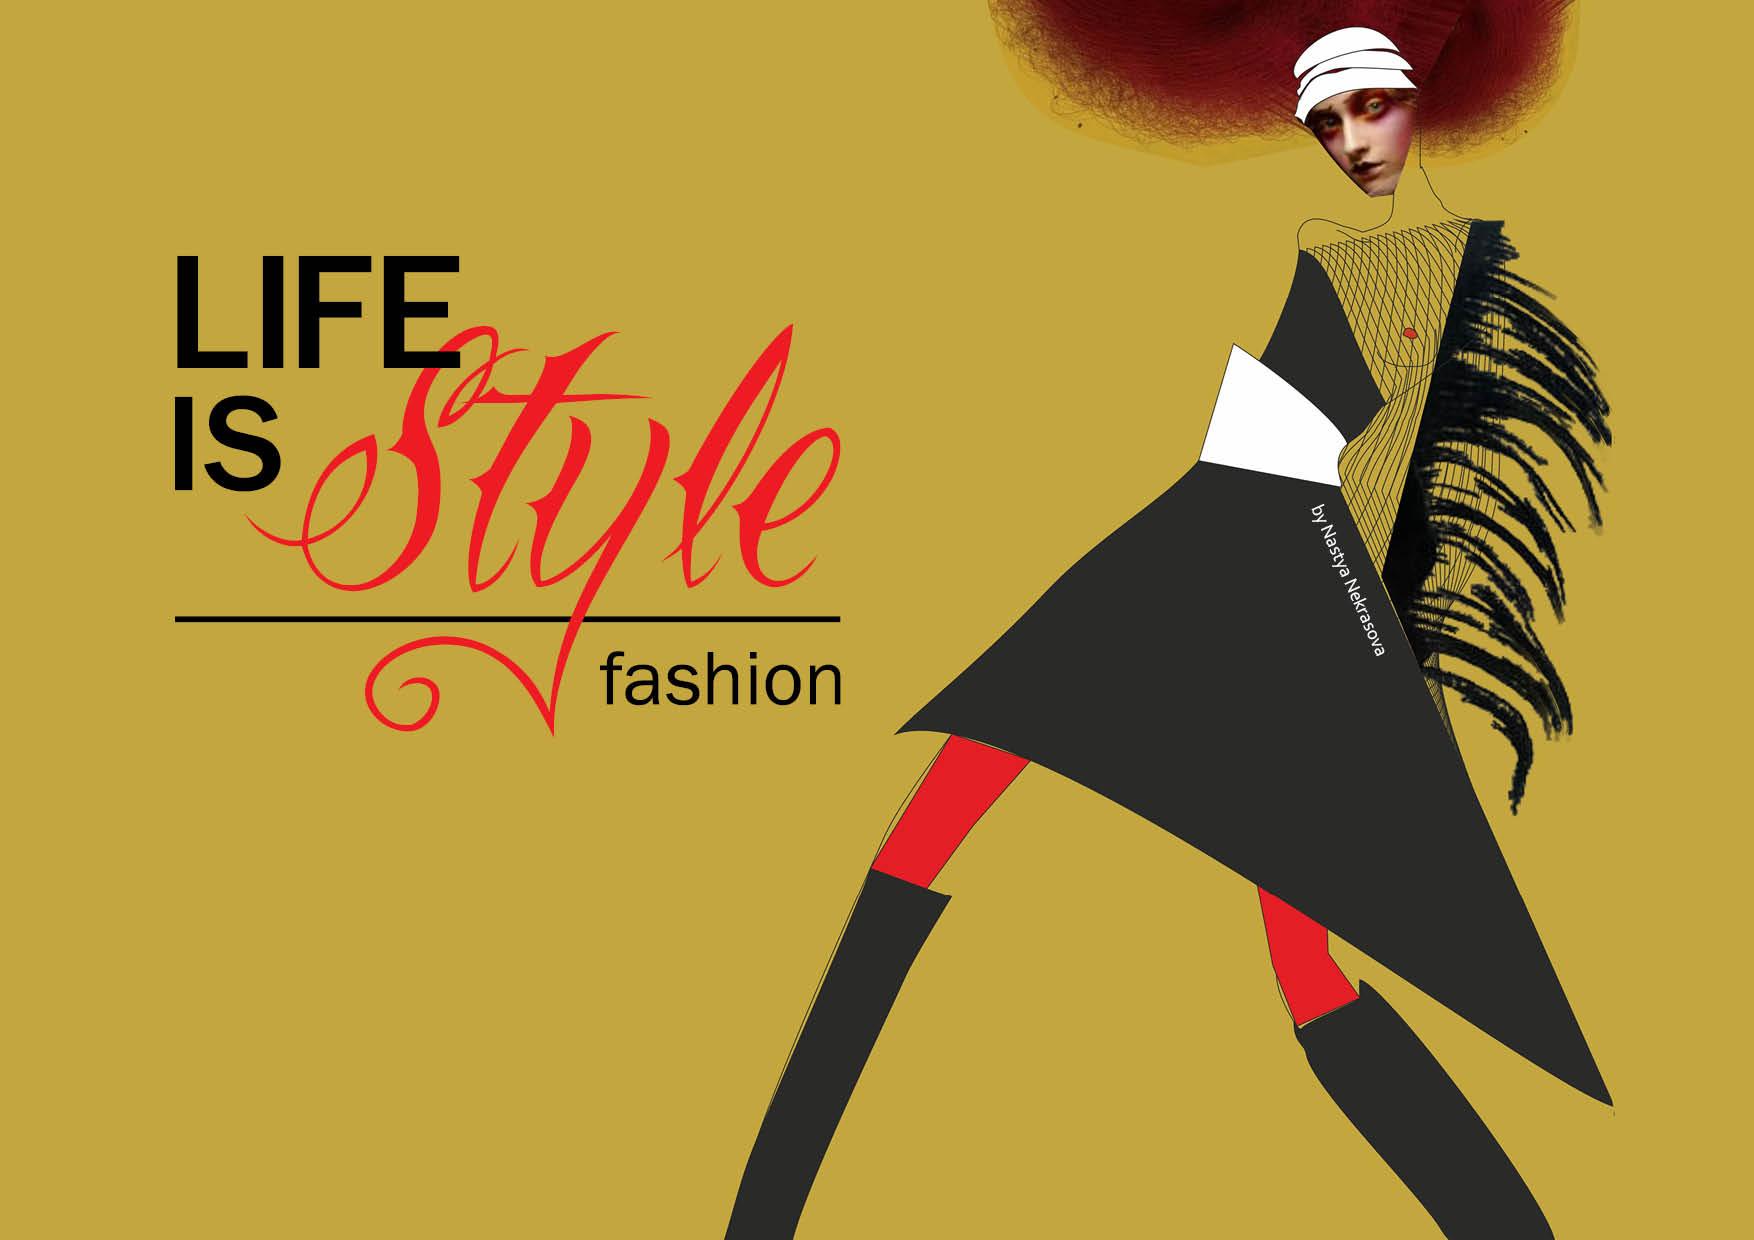 Live 4 life fashion